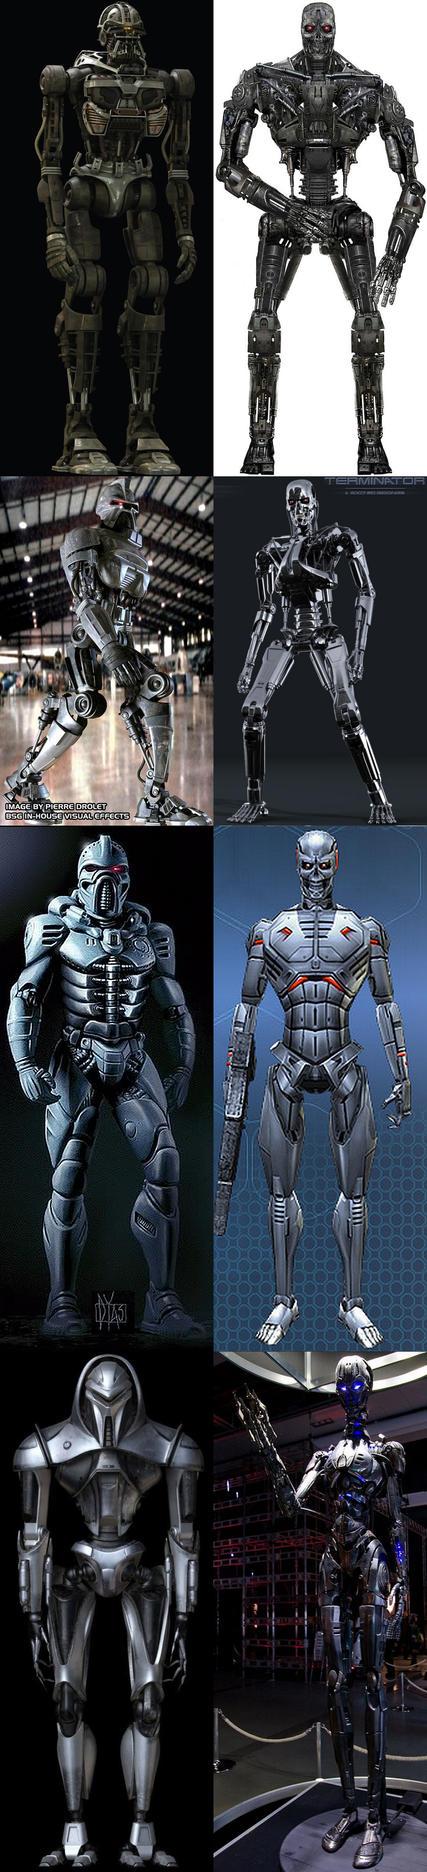 Cylon vs Terminator by viktor9ov